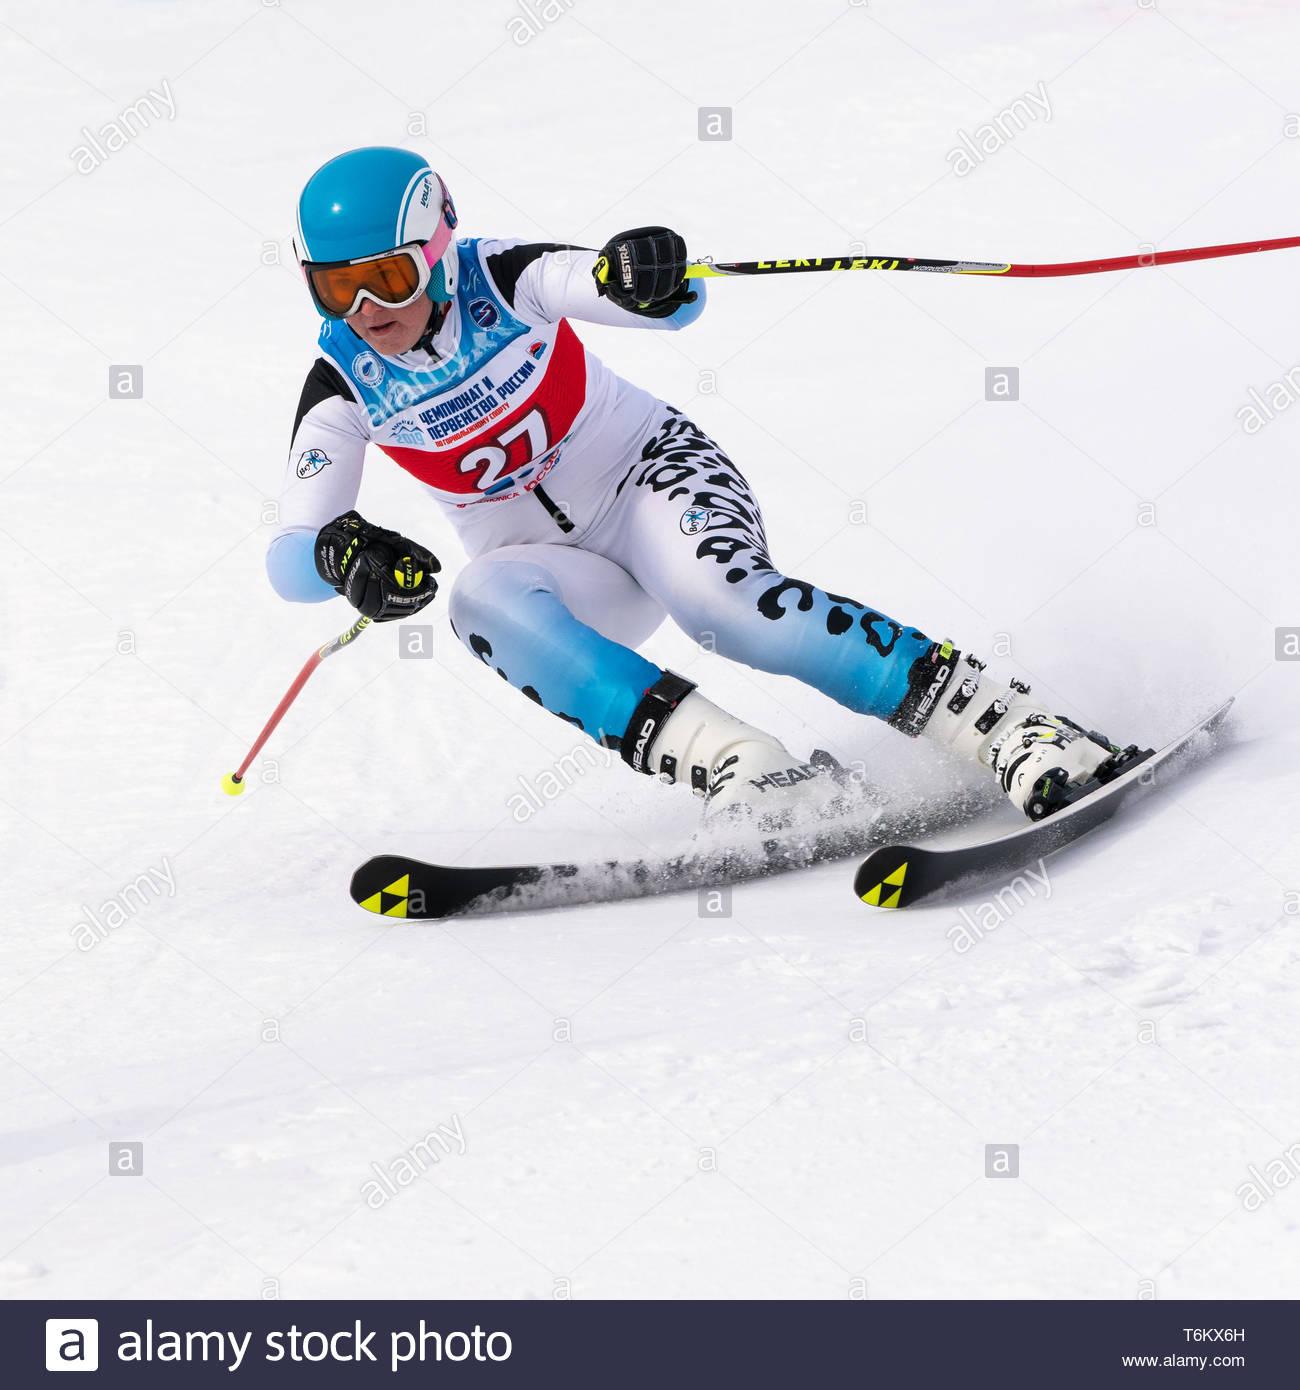 KAMCHATKA PENINSULA, RUSSIA - APR 2, 2019: Mountain skier Gavrish Veronika (Murmansk) skiing down mount slope. Russian Women's Alpine Skiing Cup, Inte - Stock Image